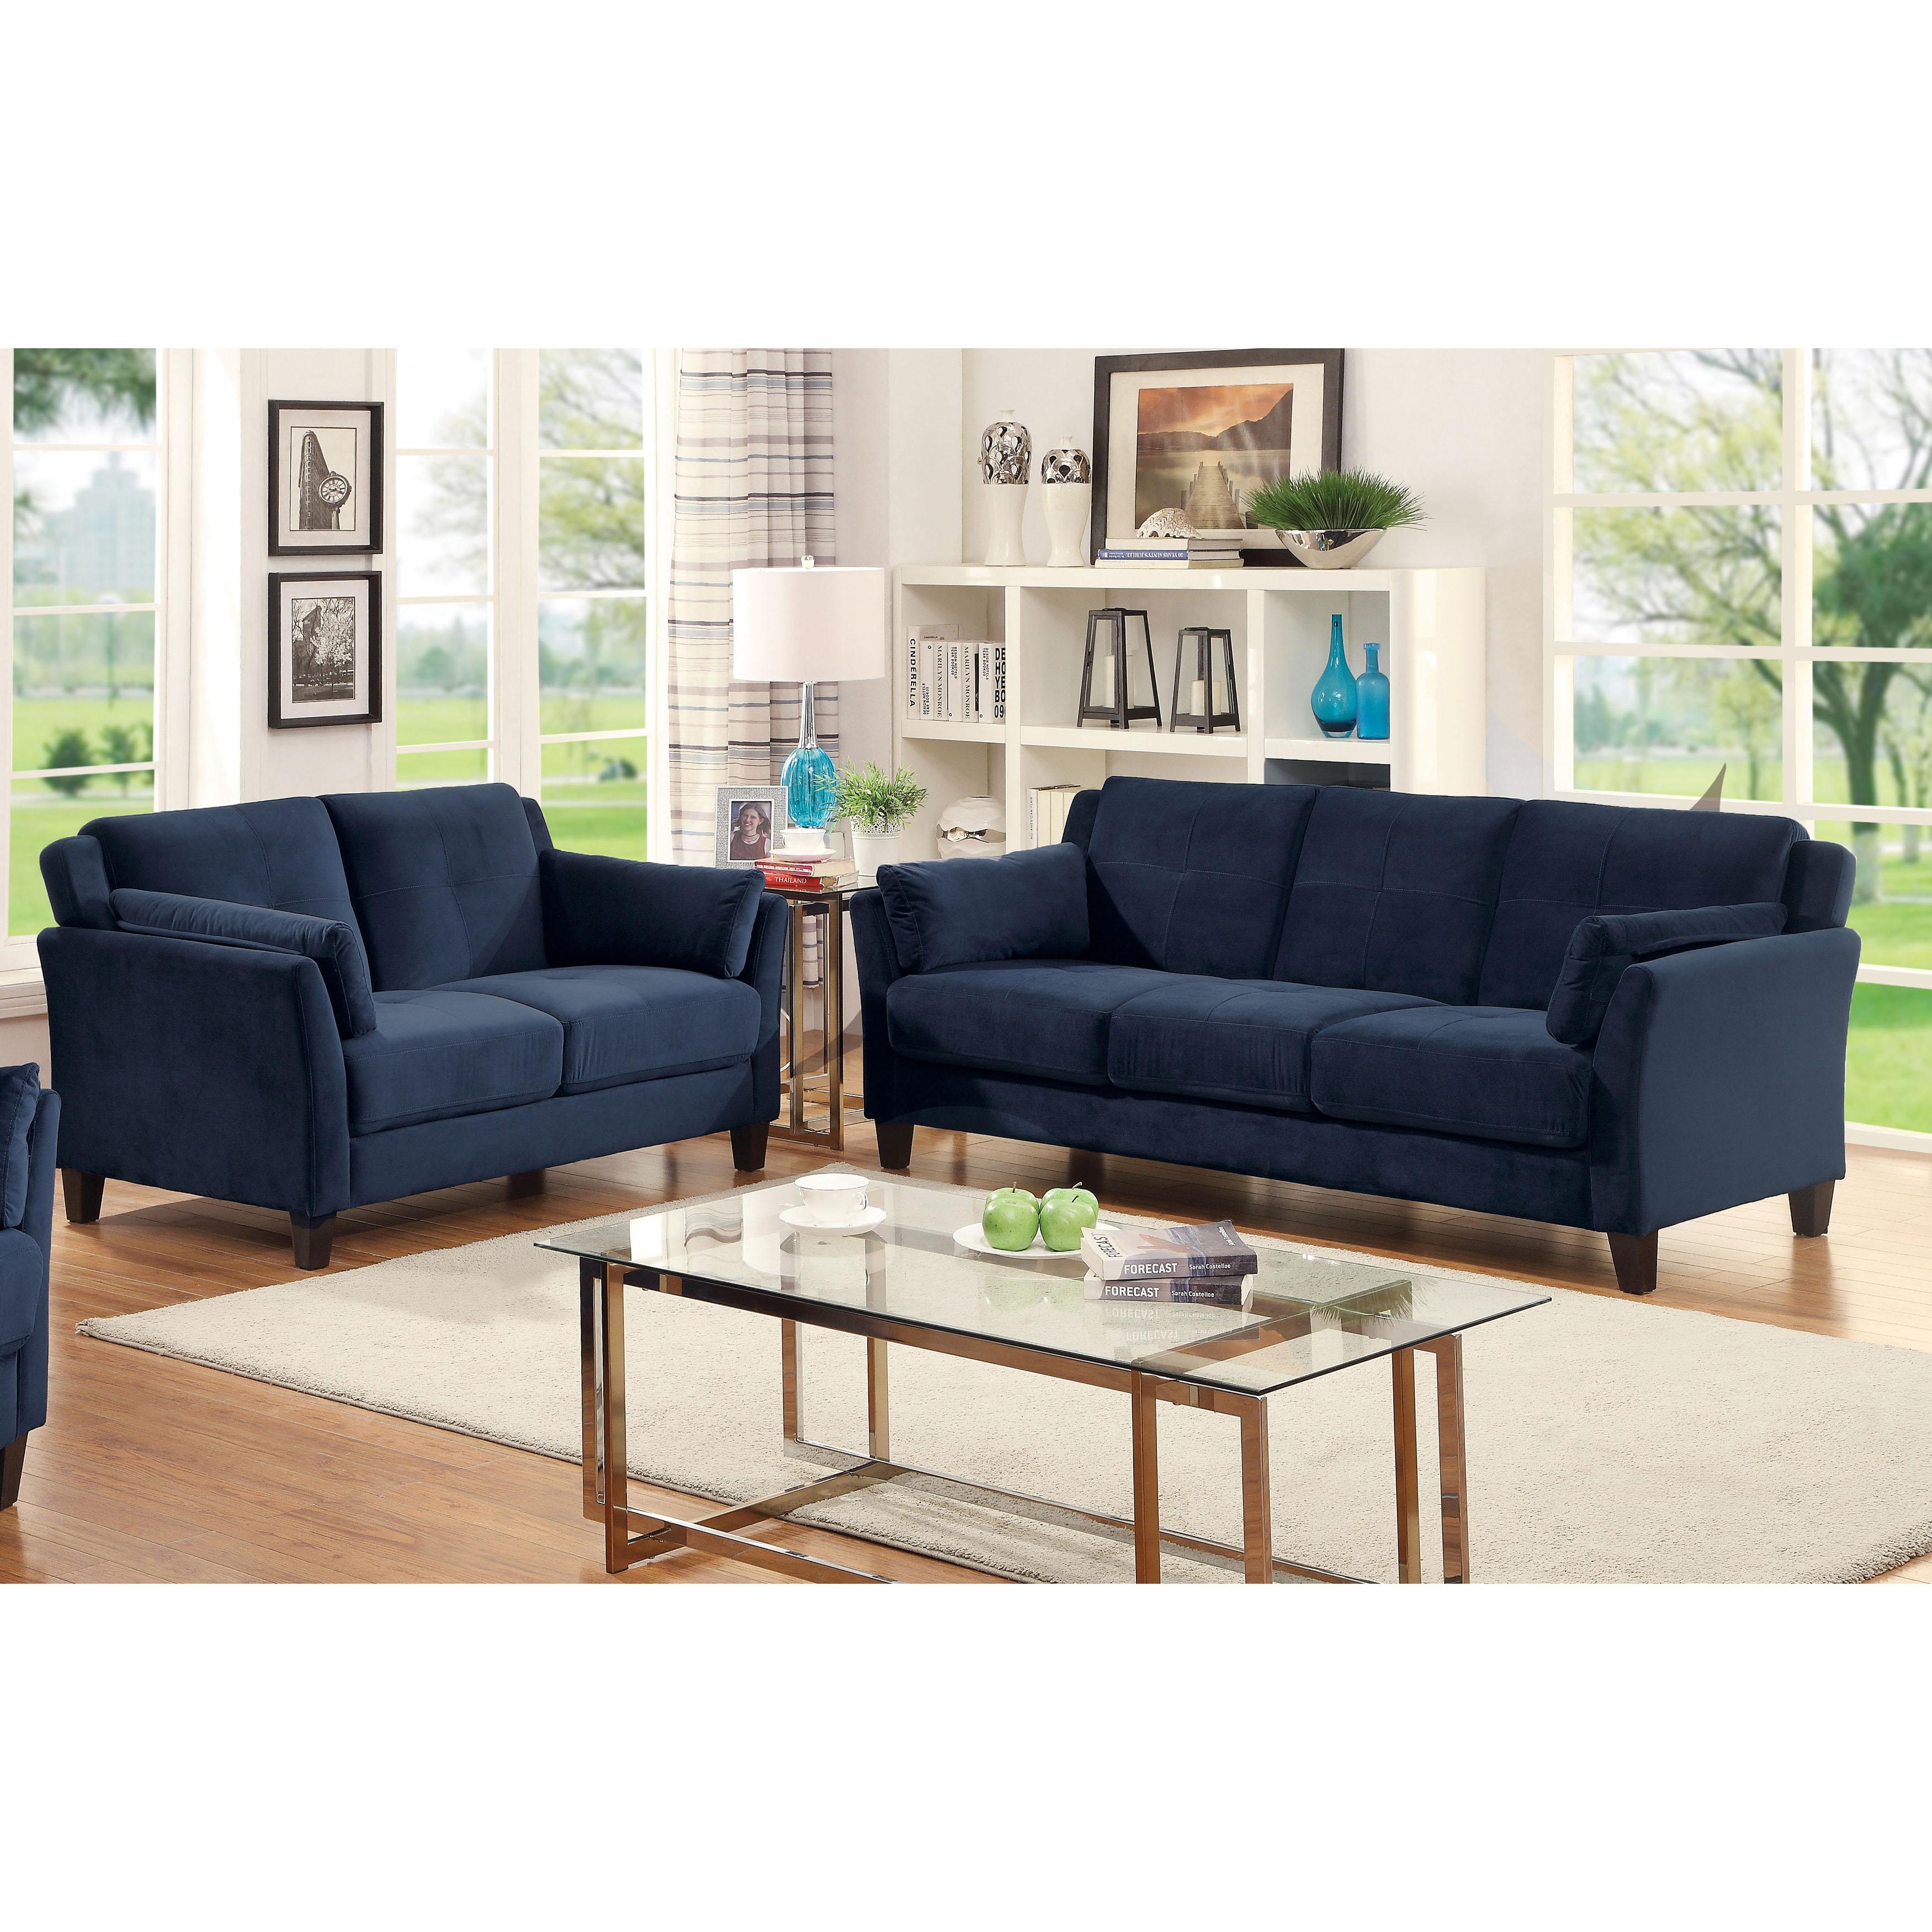 sears sofa sets slip covers canada set bobs furniture living room